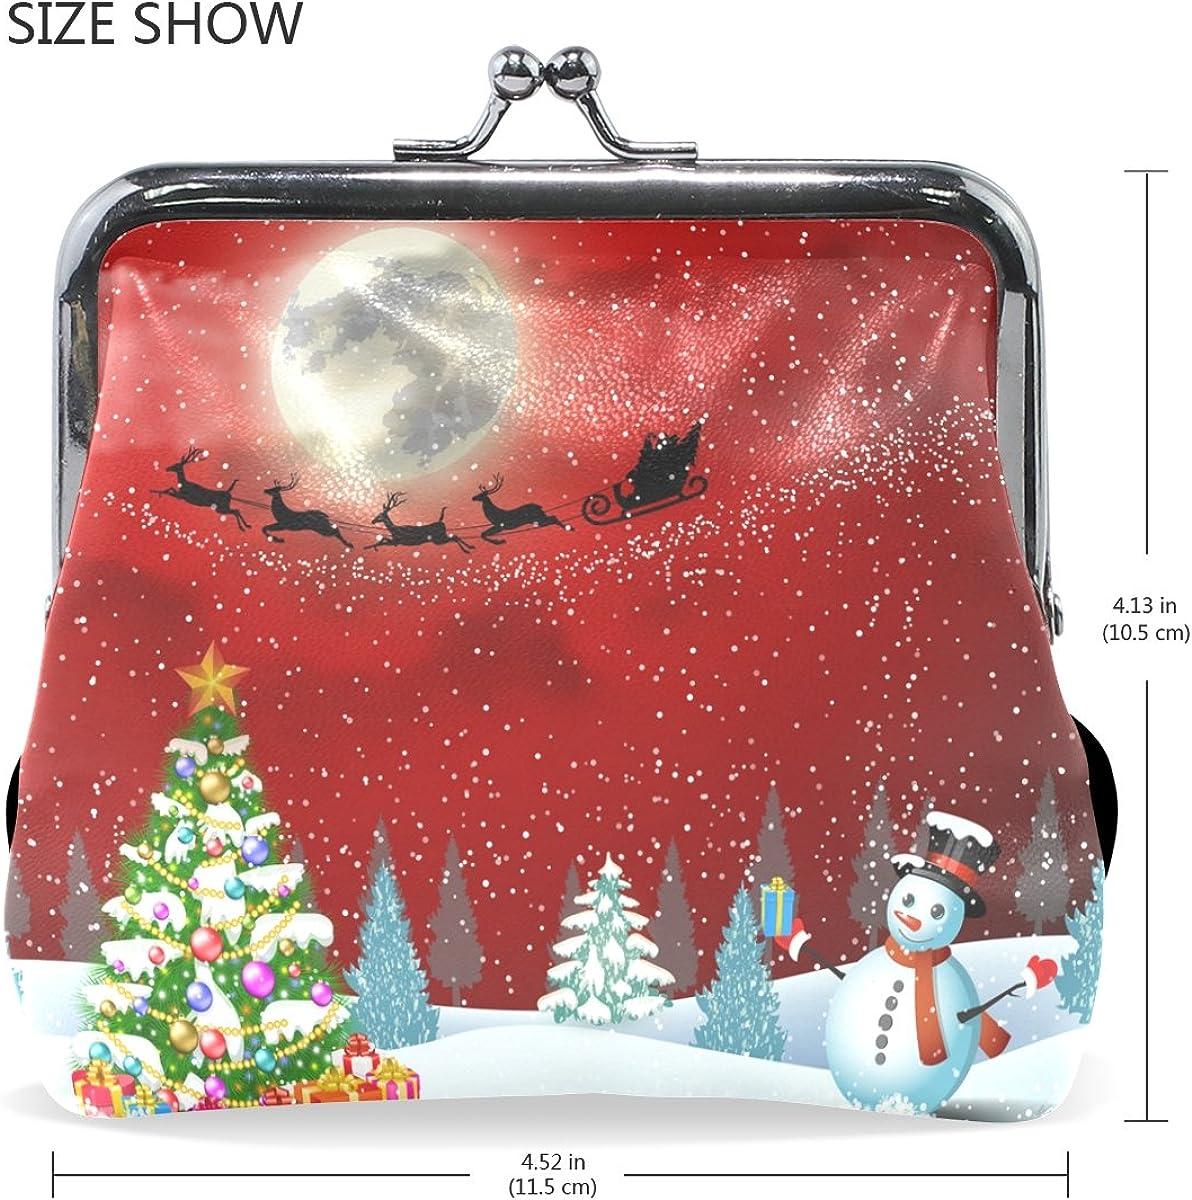 Coin Purse Strawberry Water Wallet Buckle Clutch Handbag For Women Girls Gift